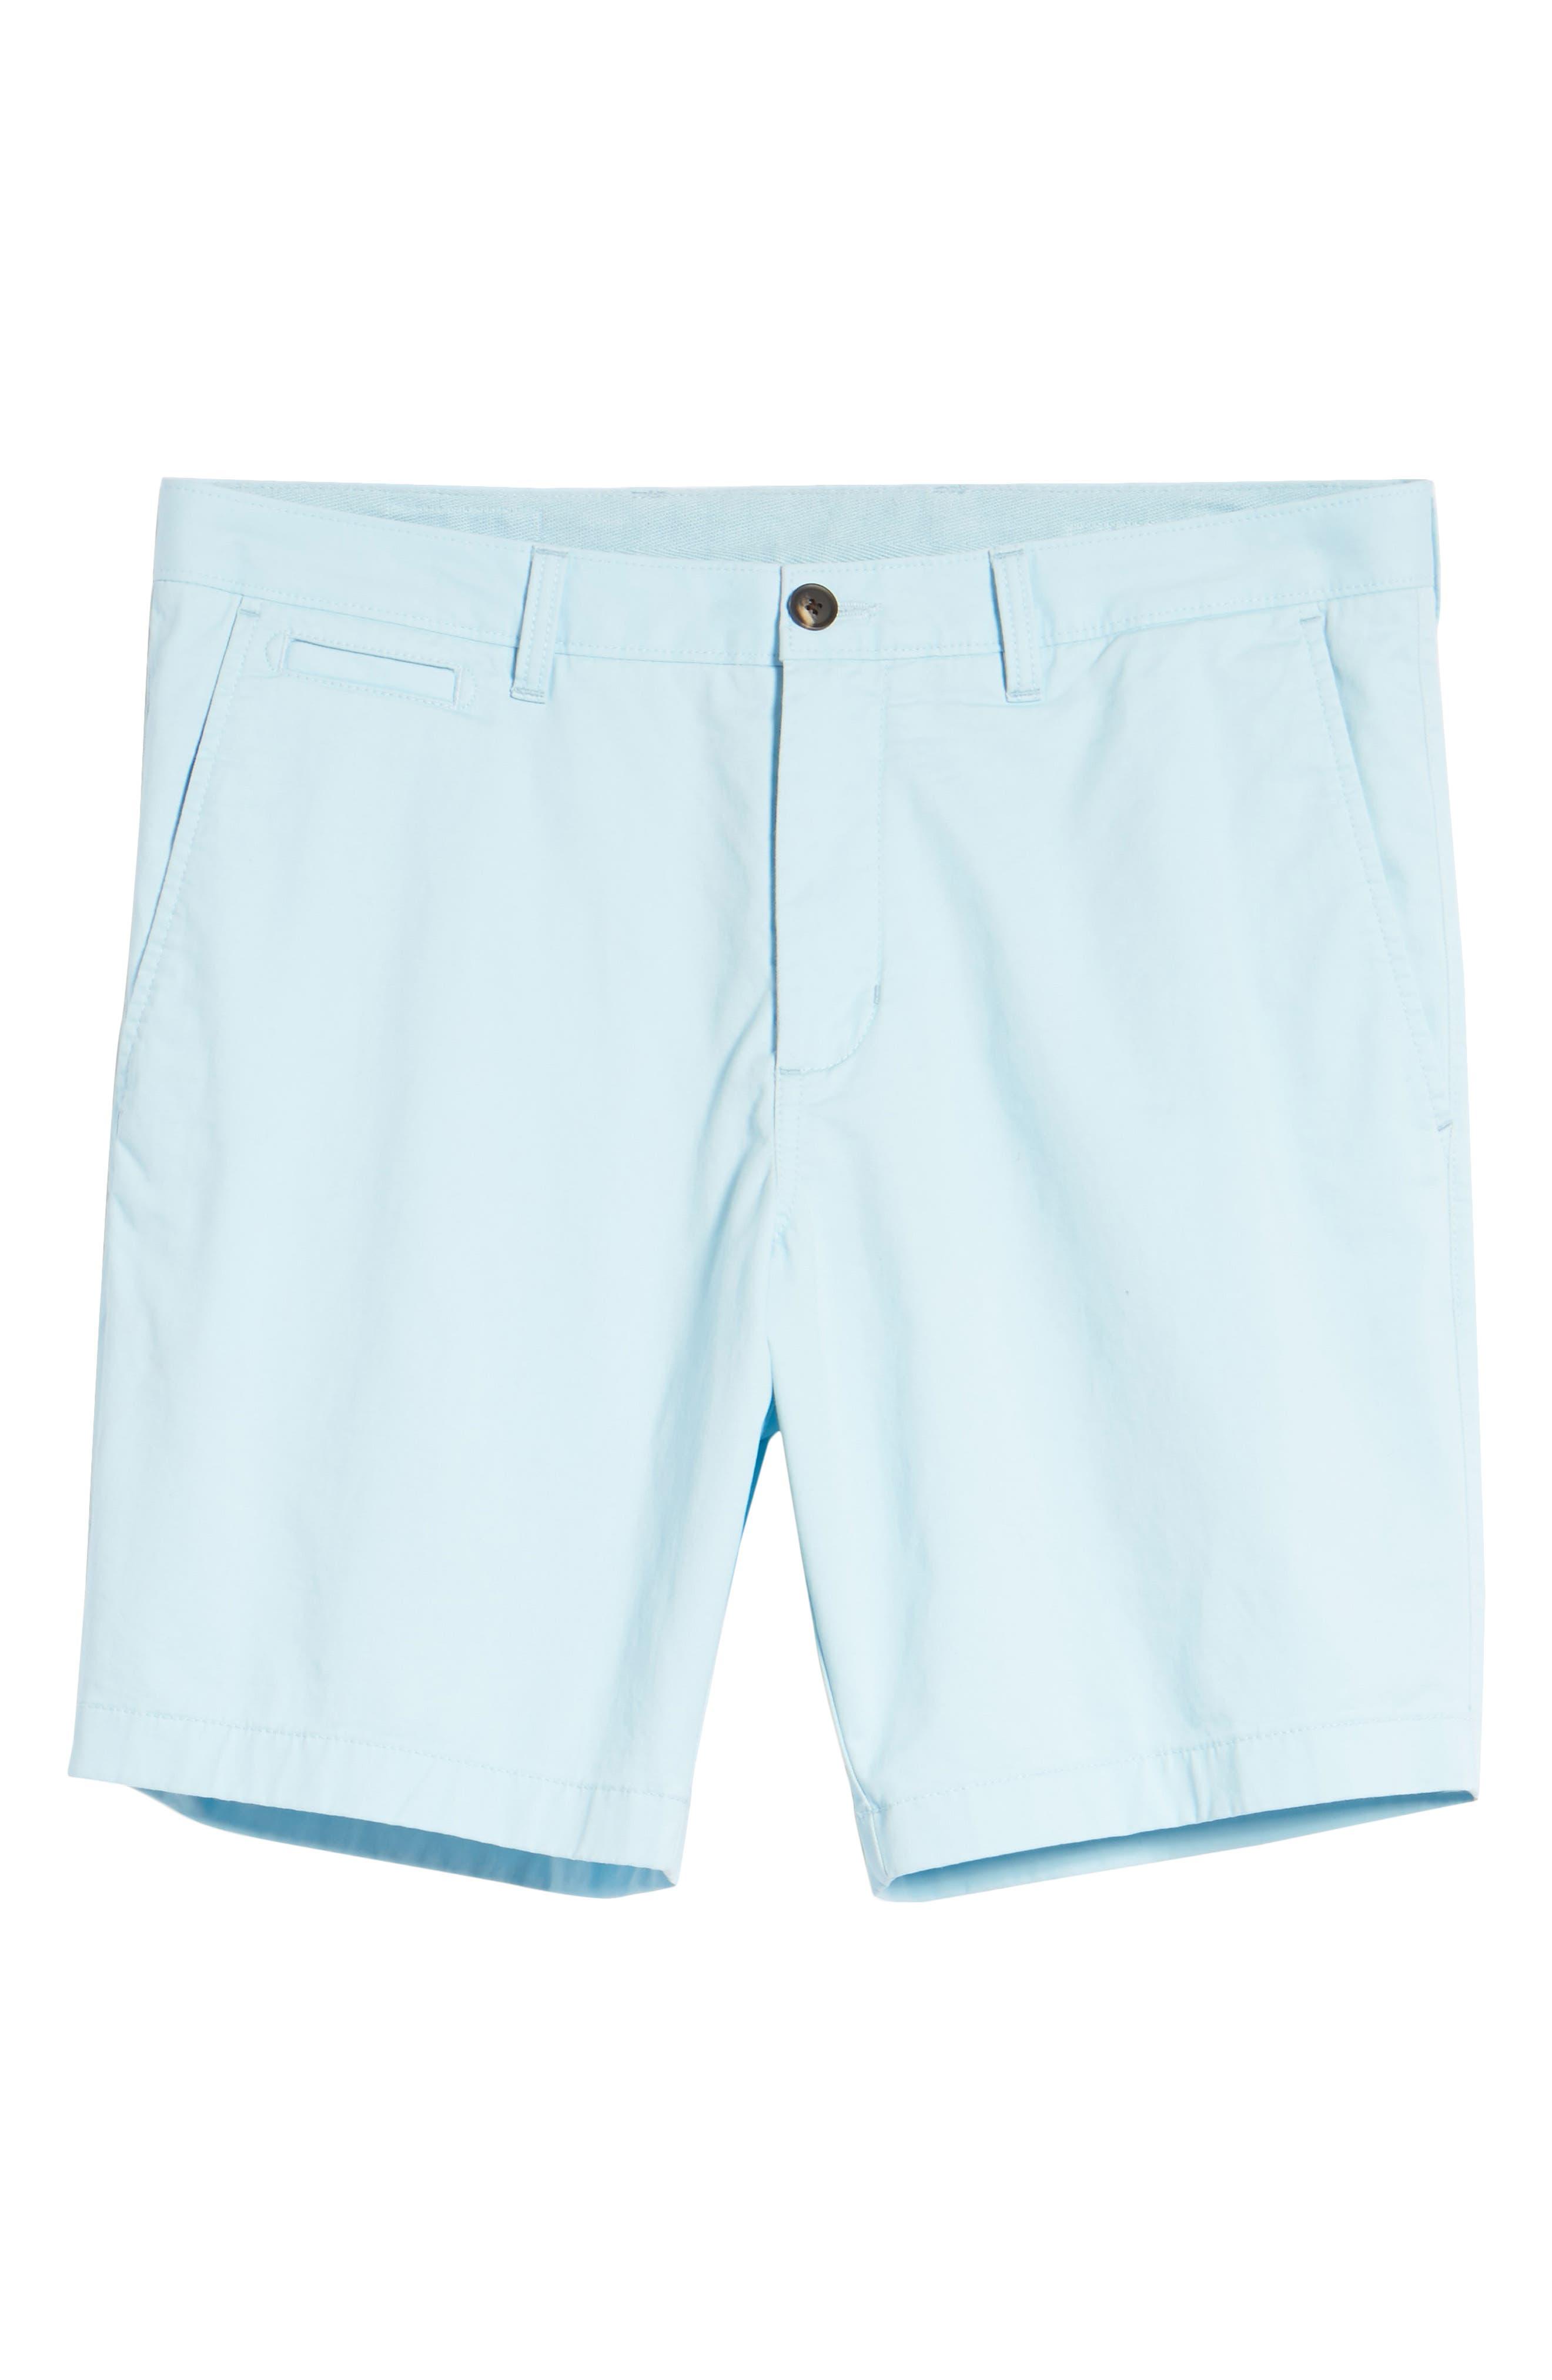 Ballard Slim Fit Stretch Chino 9-Inch Shorts,                             Alternate thumbnail 70, color,